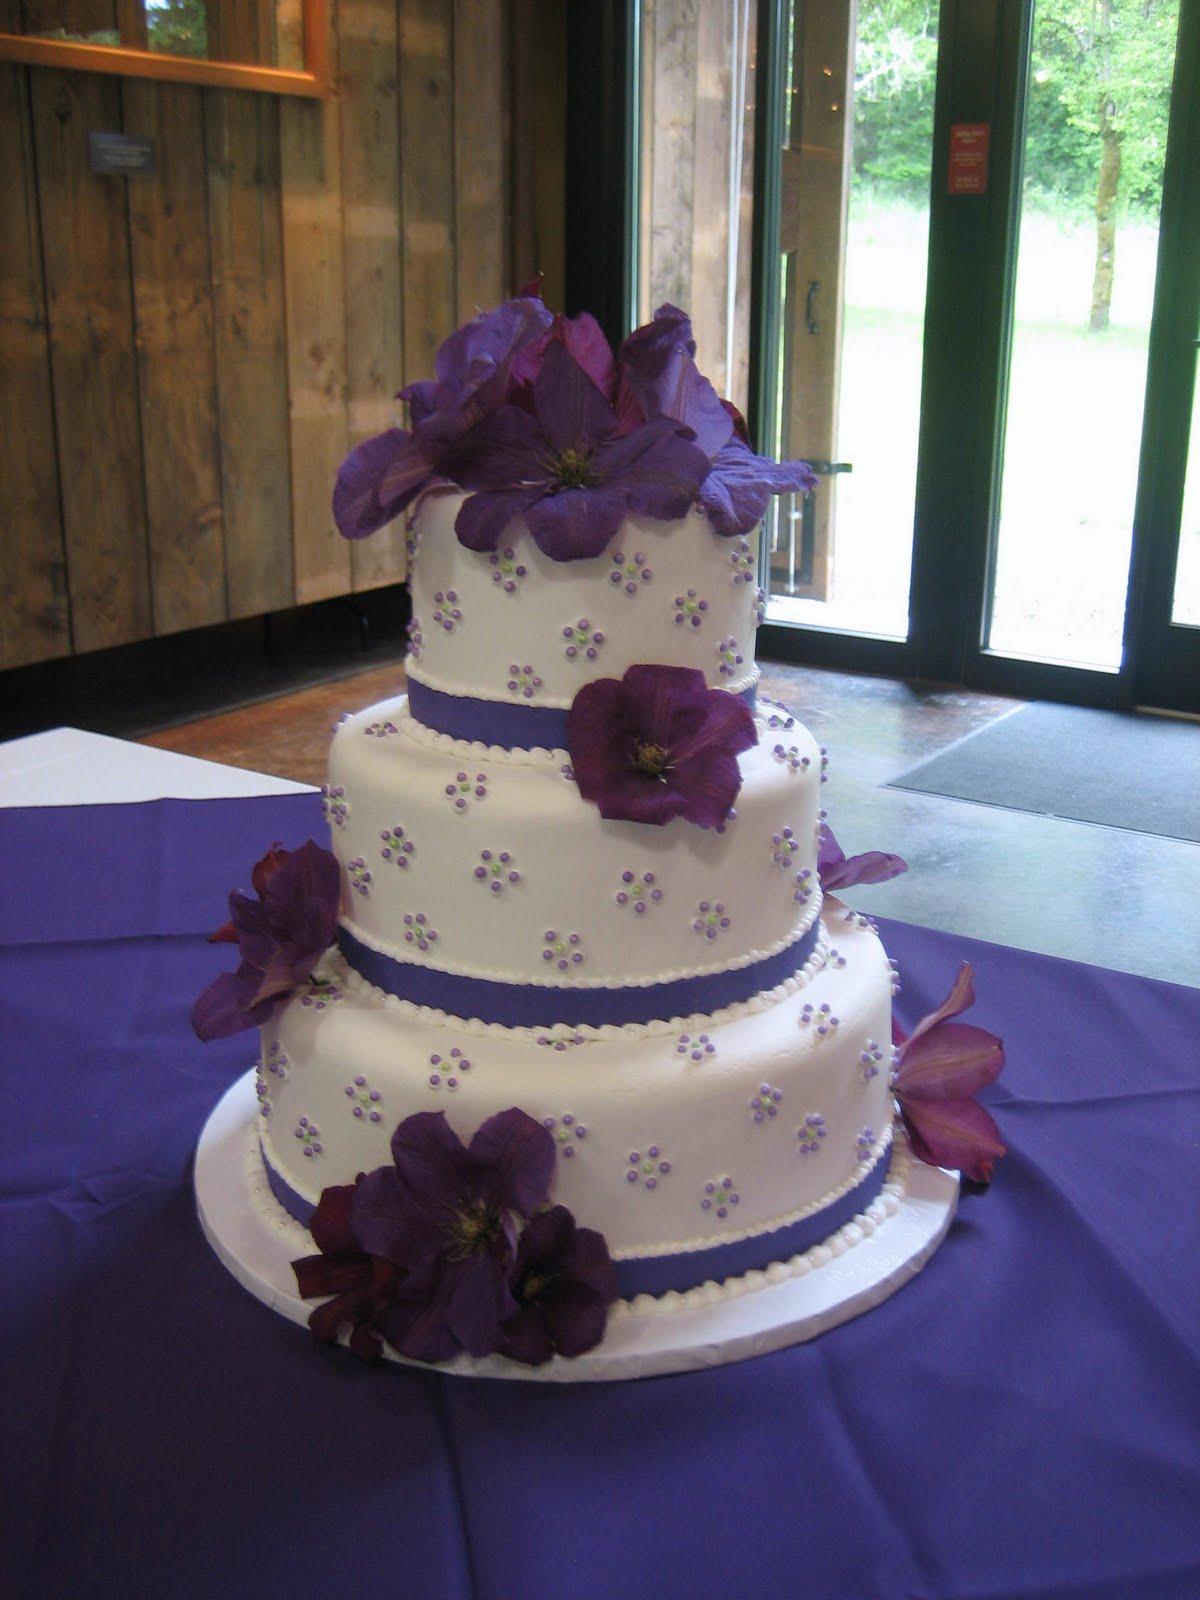 jillicious discoveries three purple wedding cakes. Black Bedroom Furniture Sets. Home Design Ideas